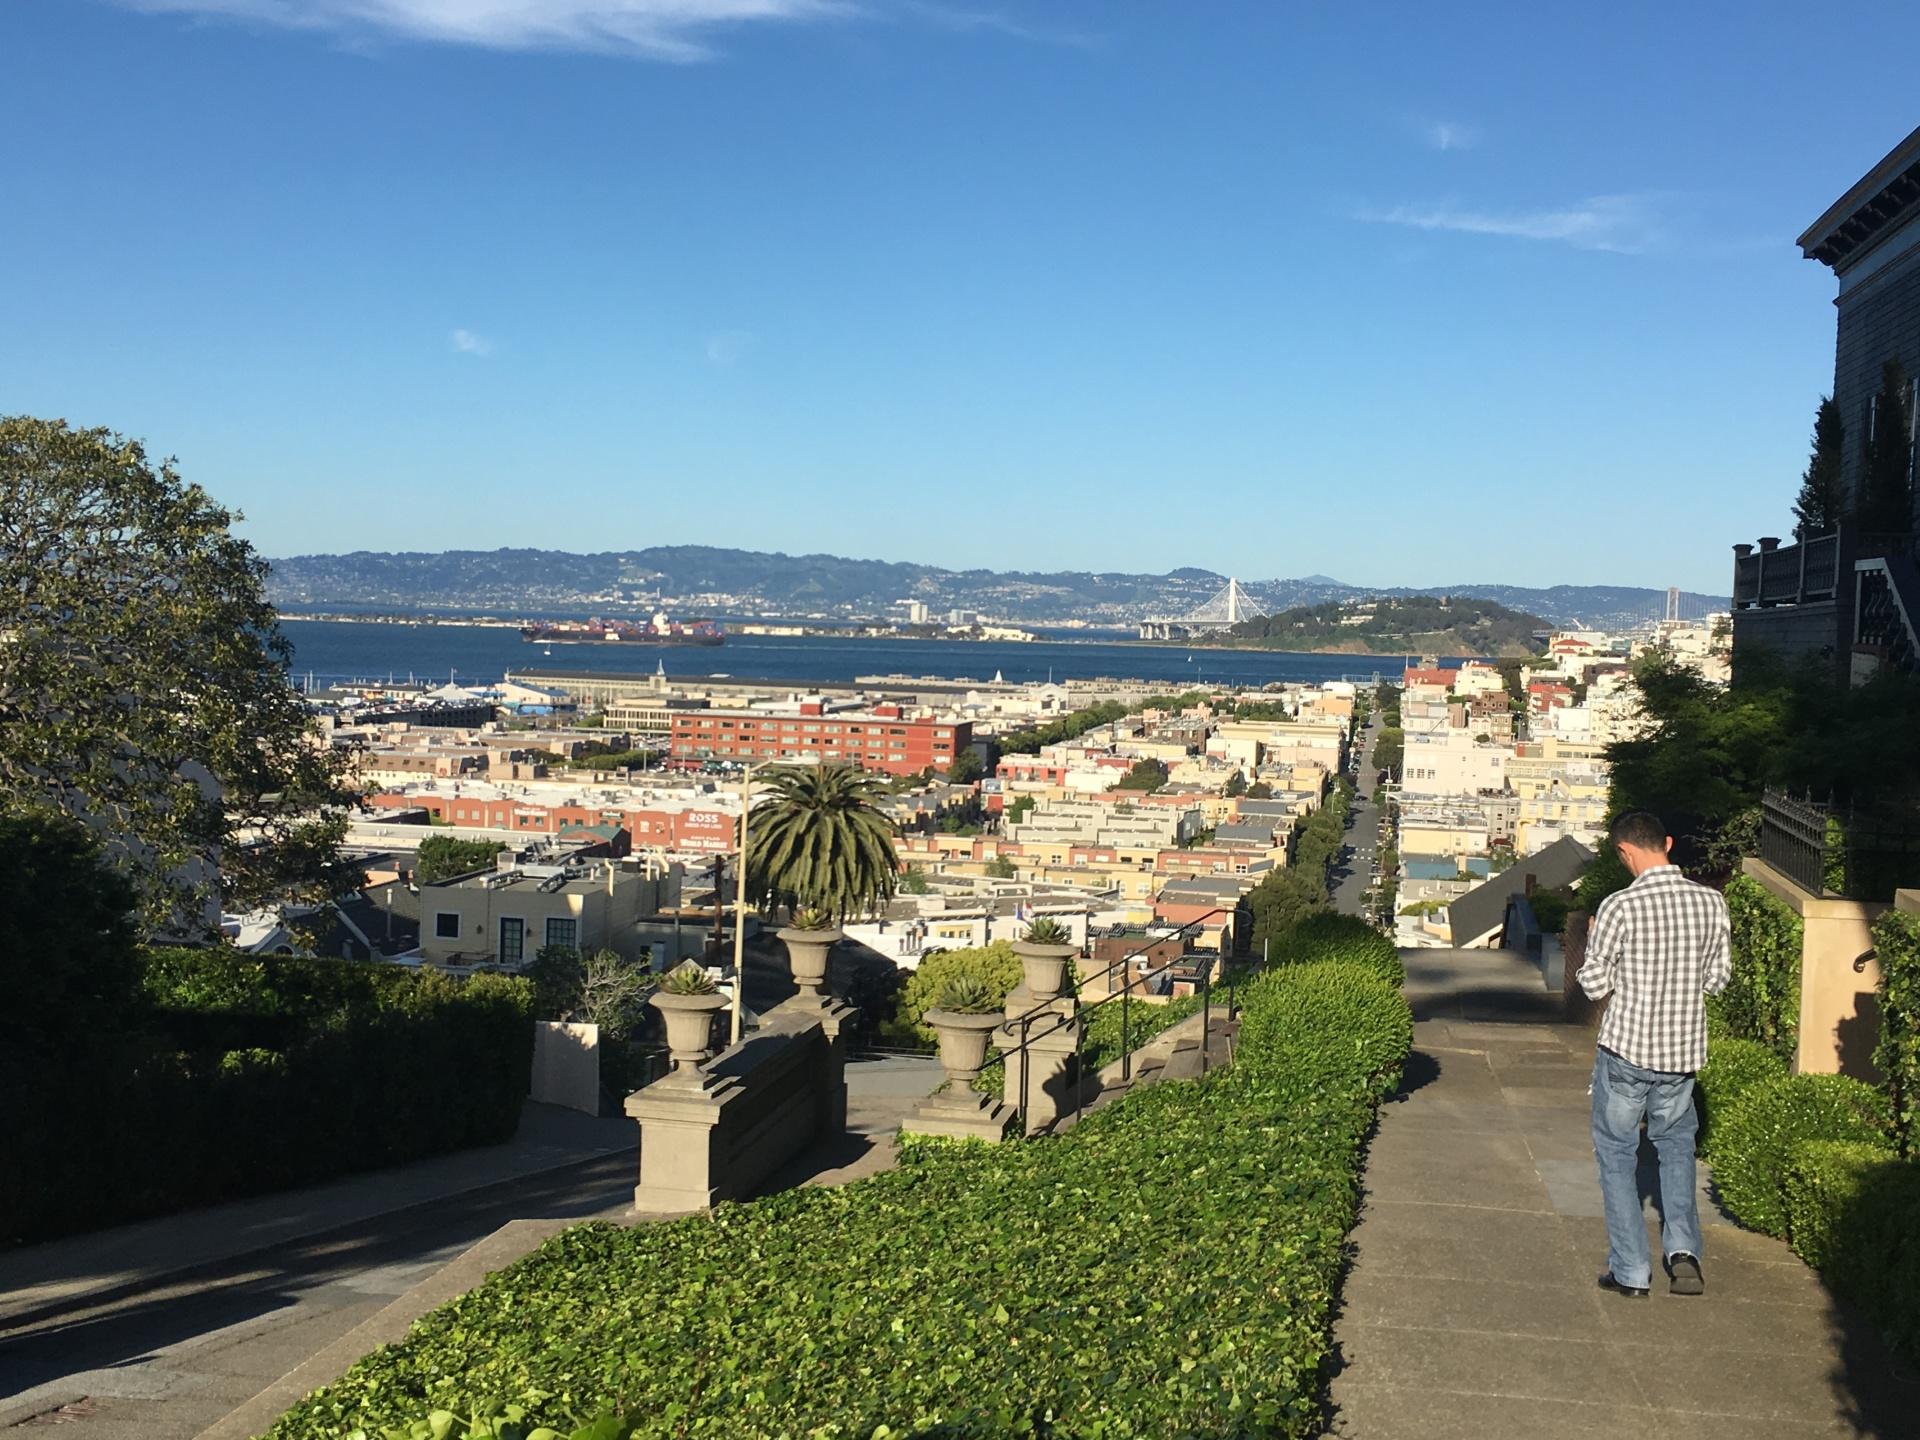 Visiting San Fransico